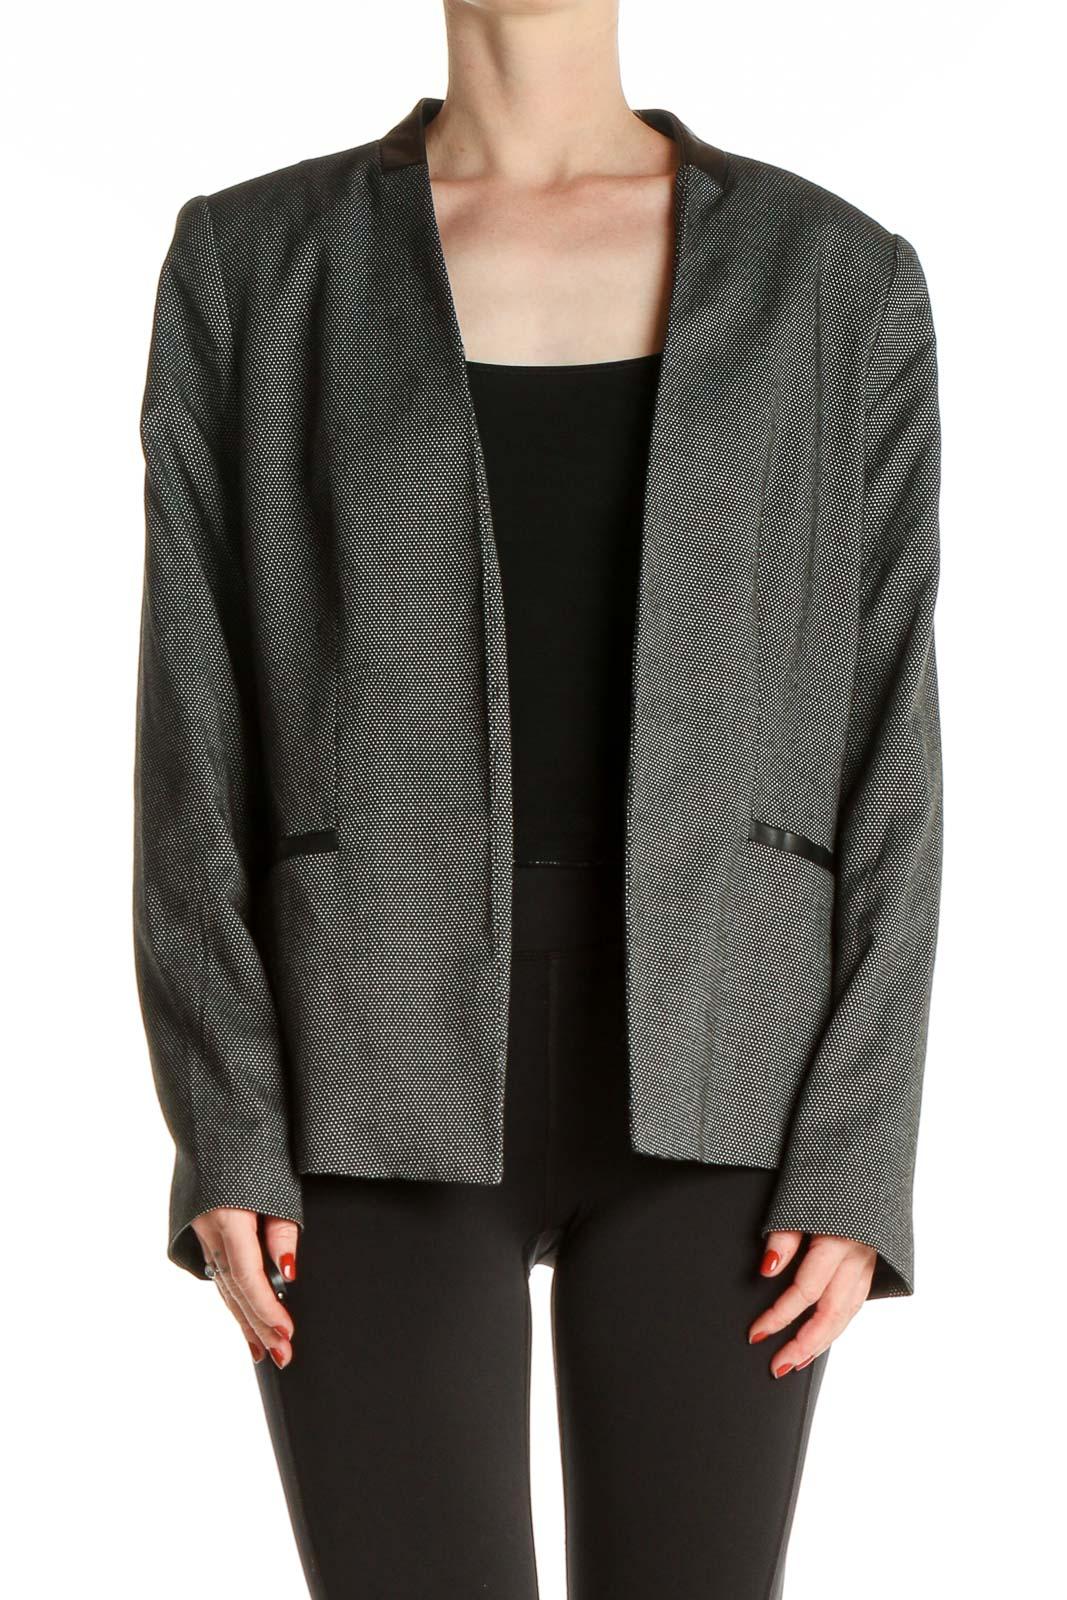 Gray Jacket Front